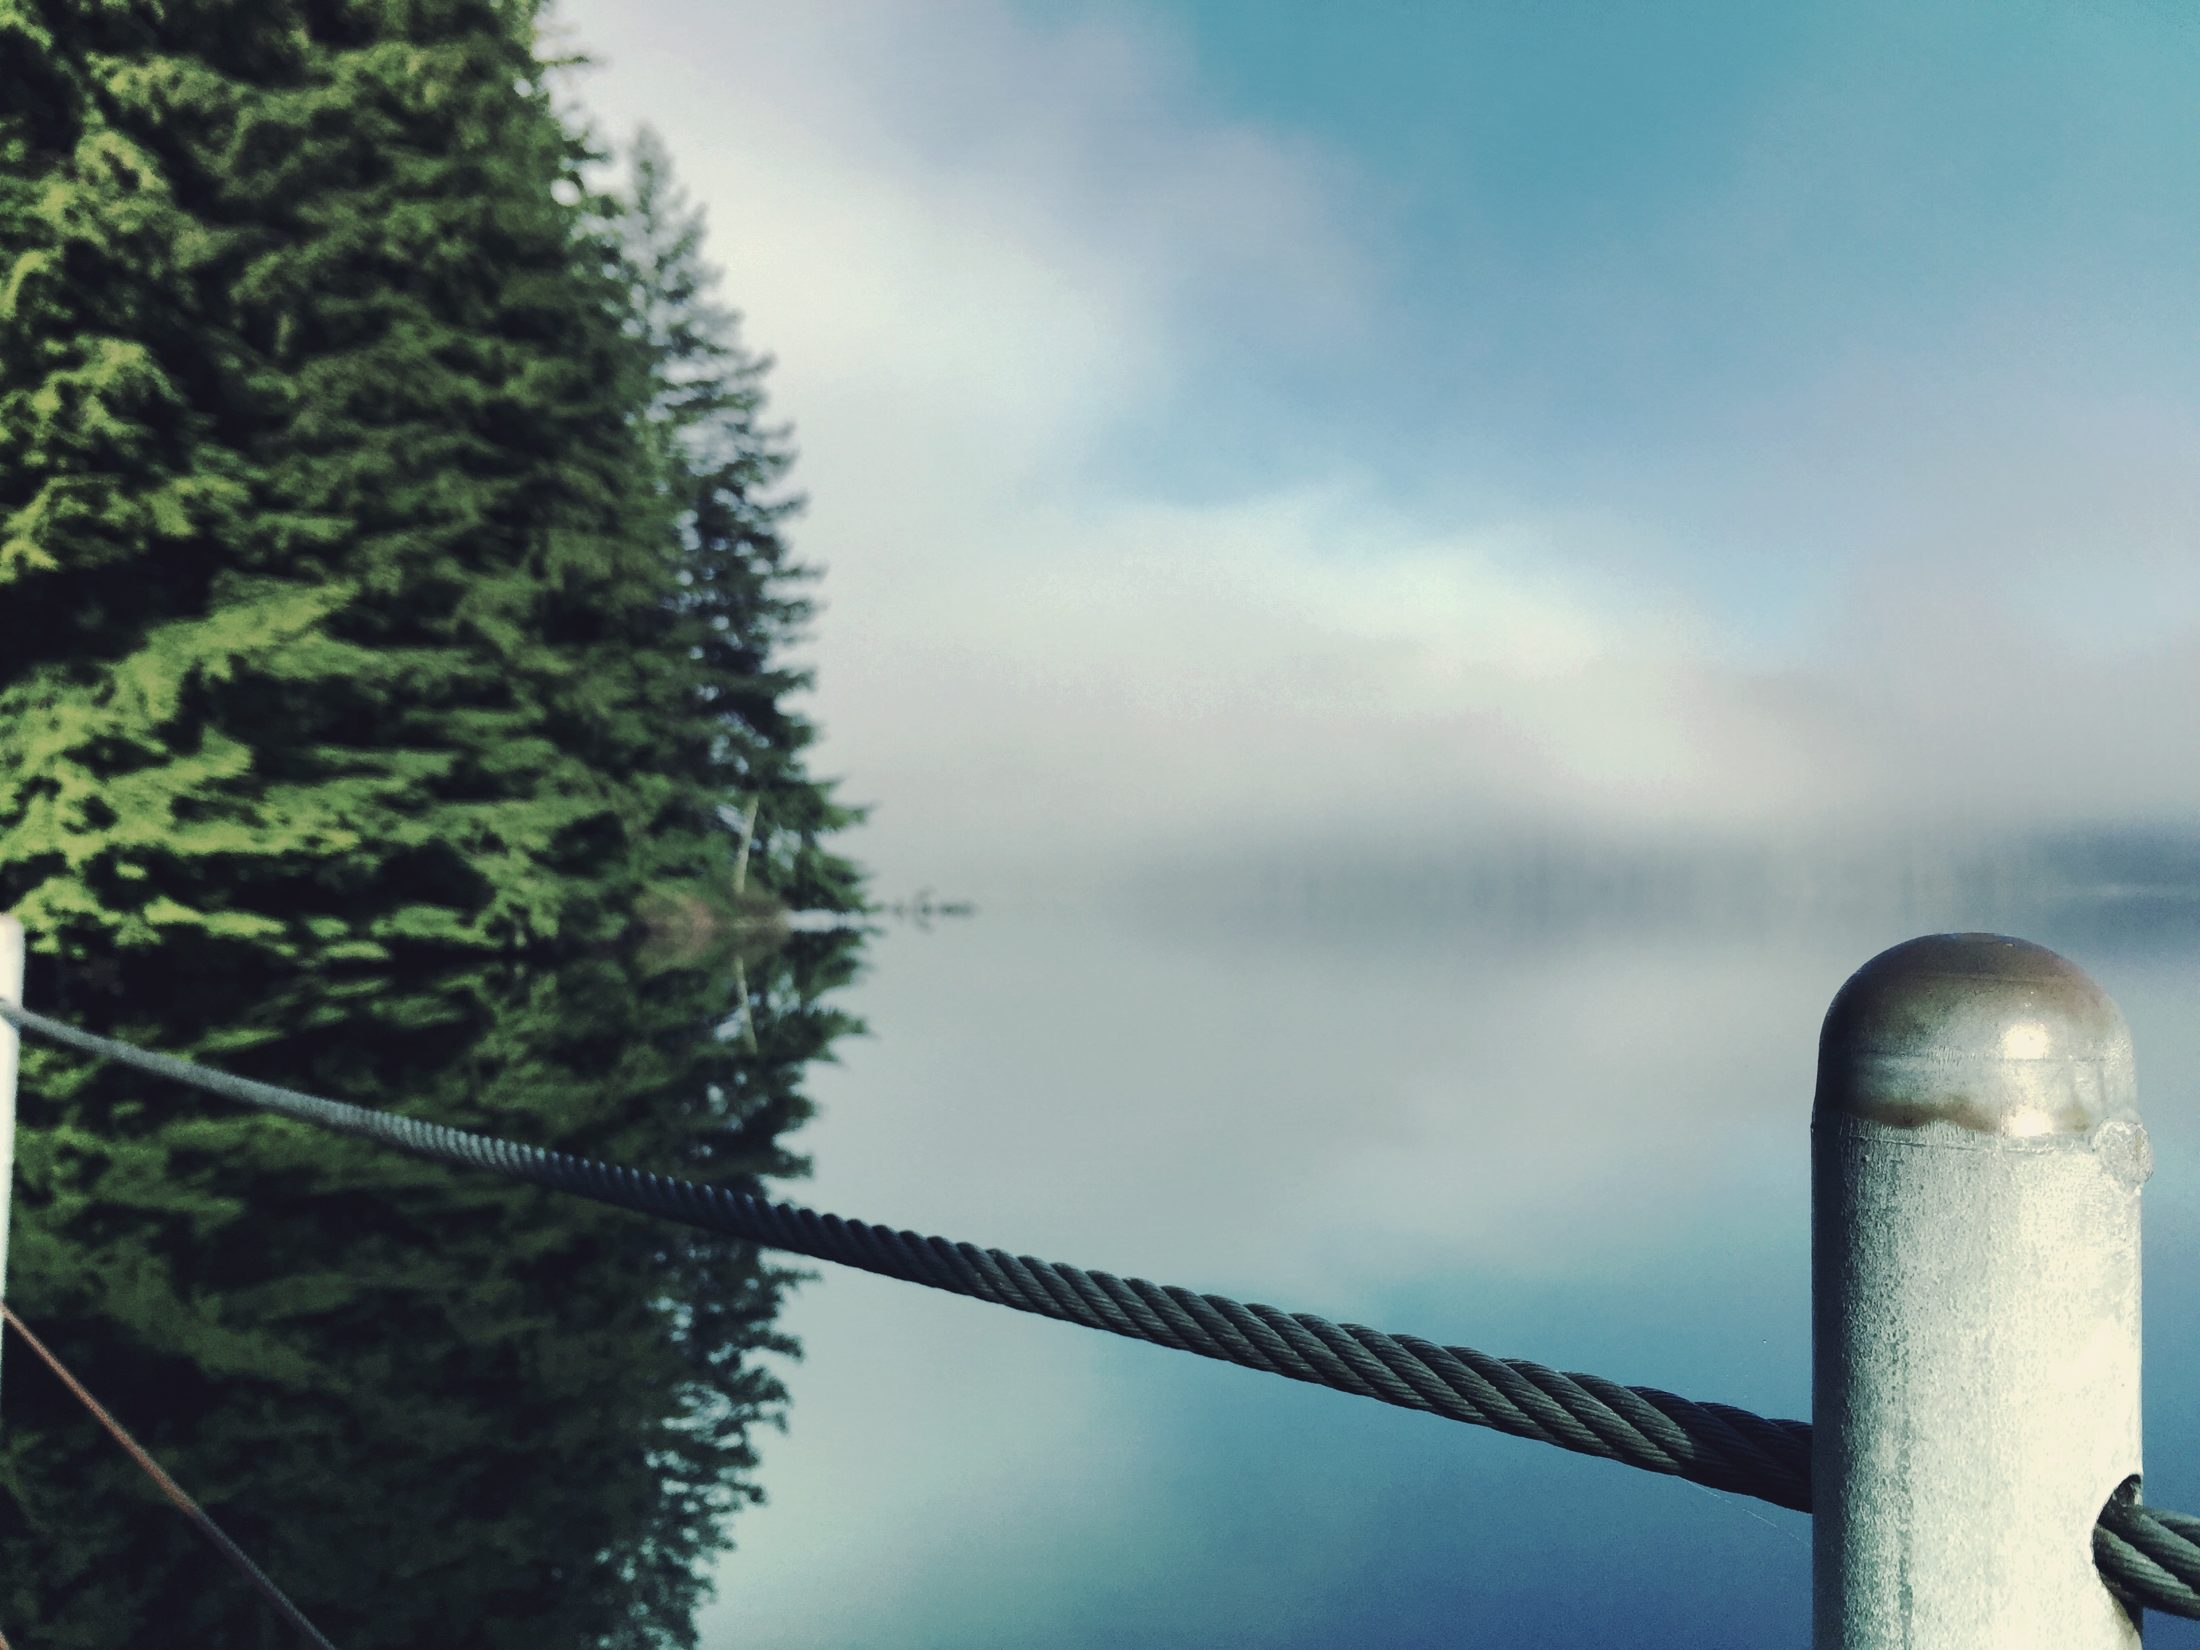 Buntzen Lake Fog